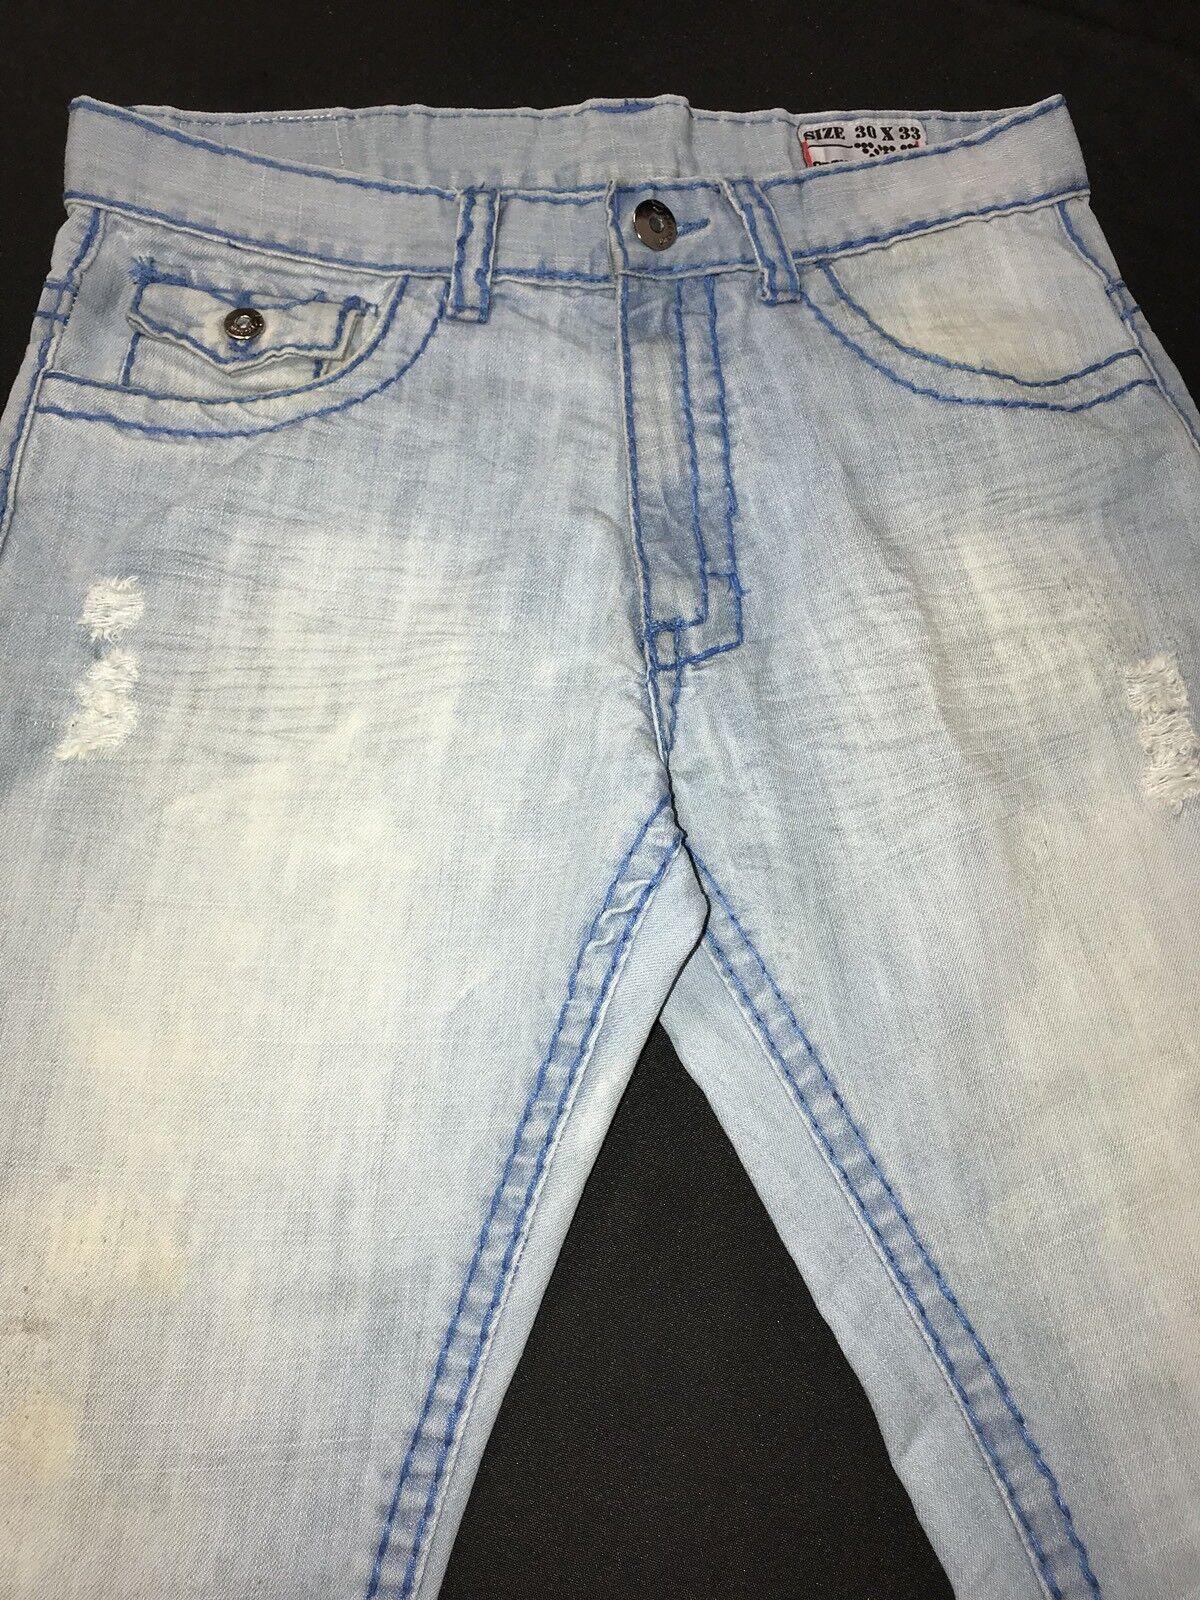 Dodeca Premium Denim Distressed Jeans Mens Sz.30x33-Cl. Strt